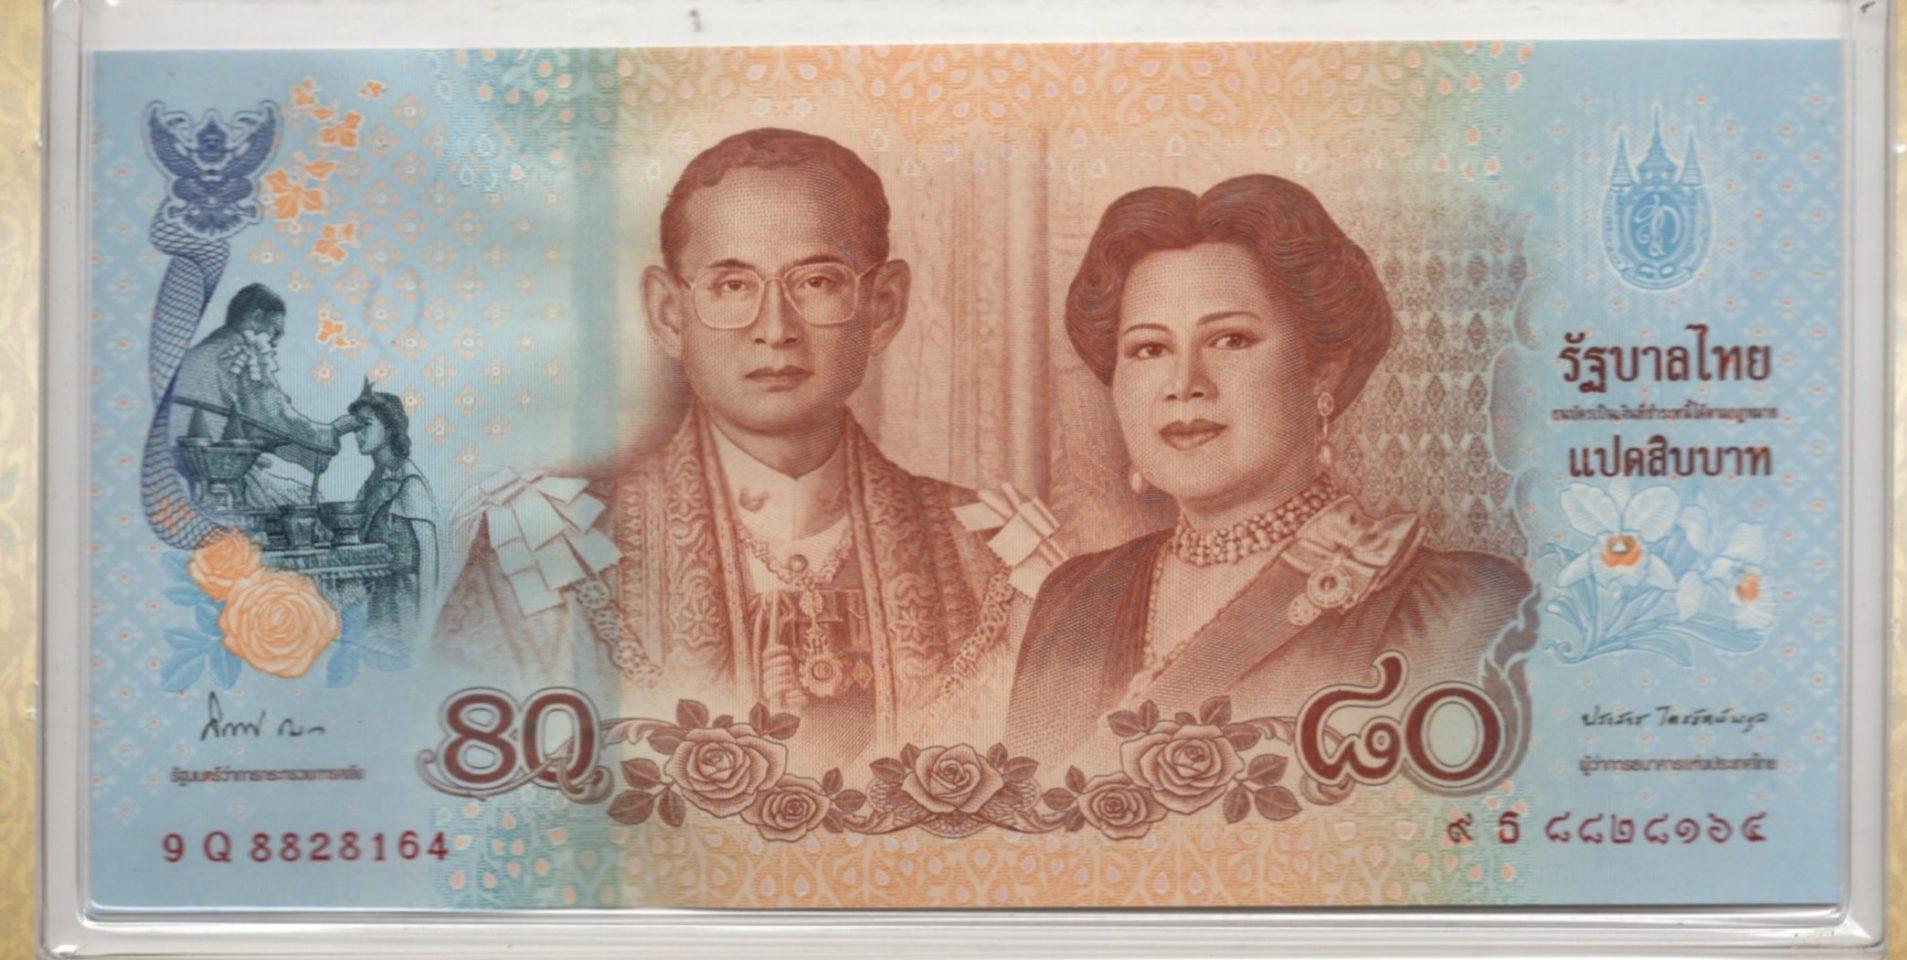 thailand 80 baht